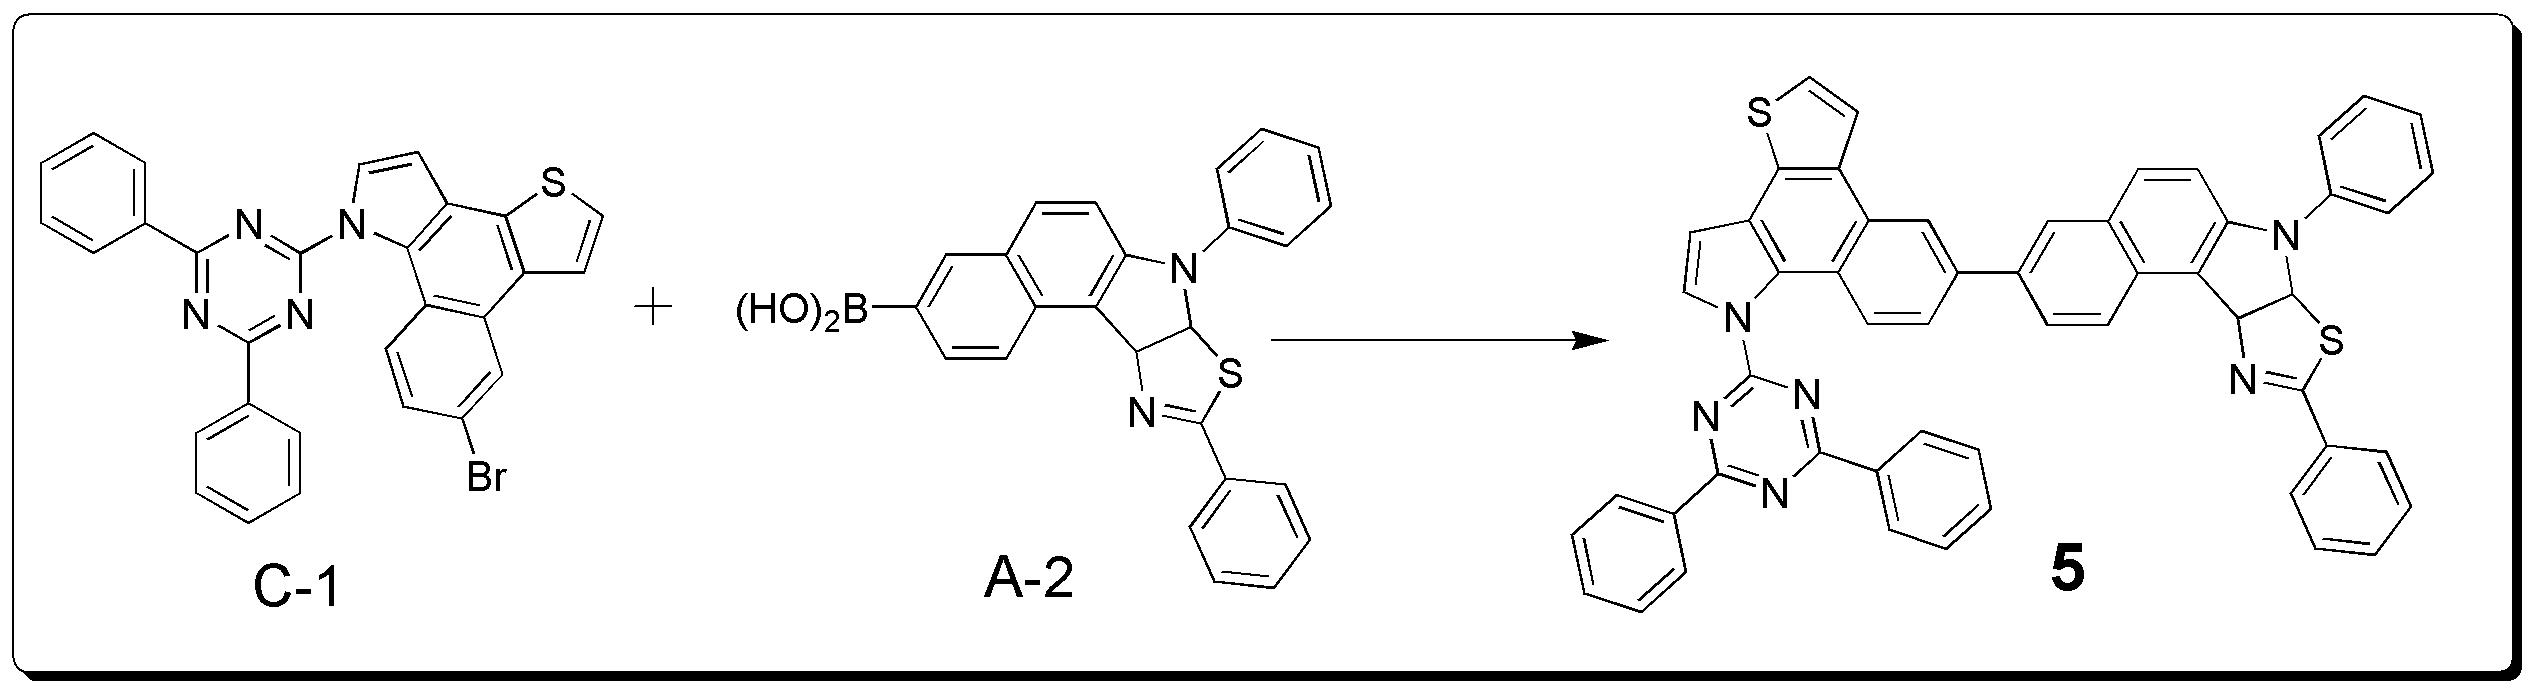 Figure pat00075